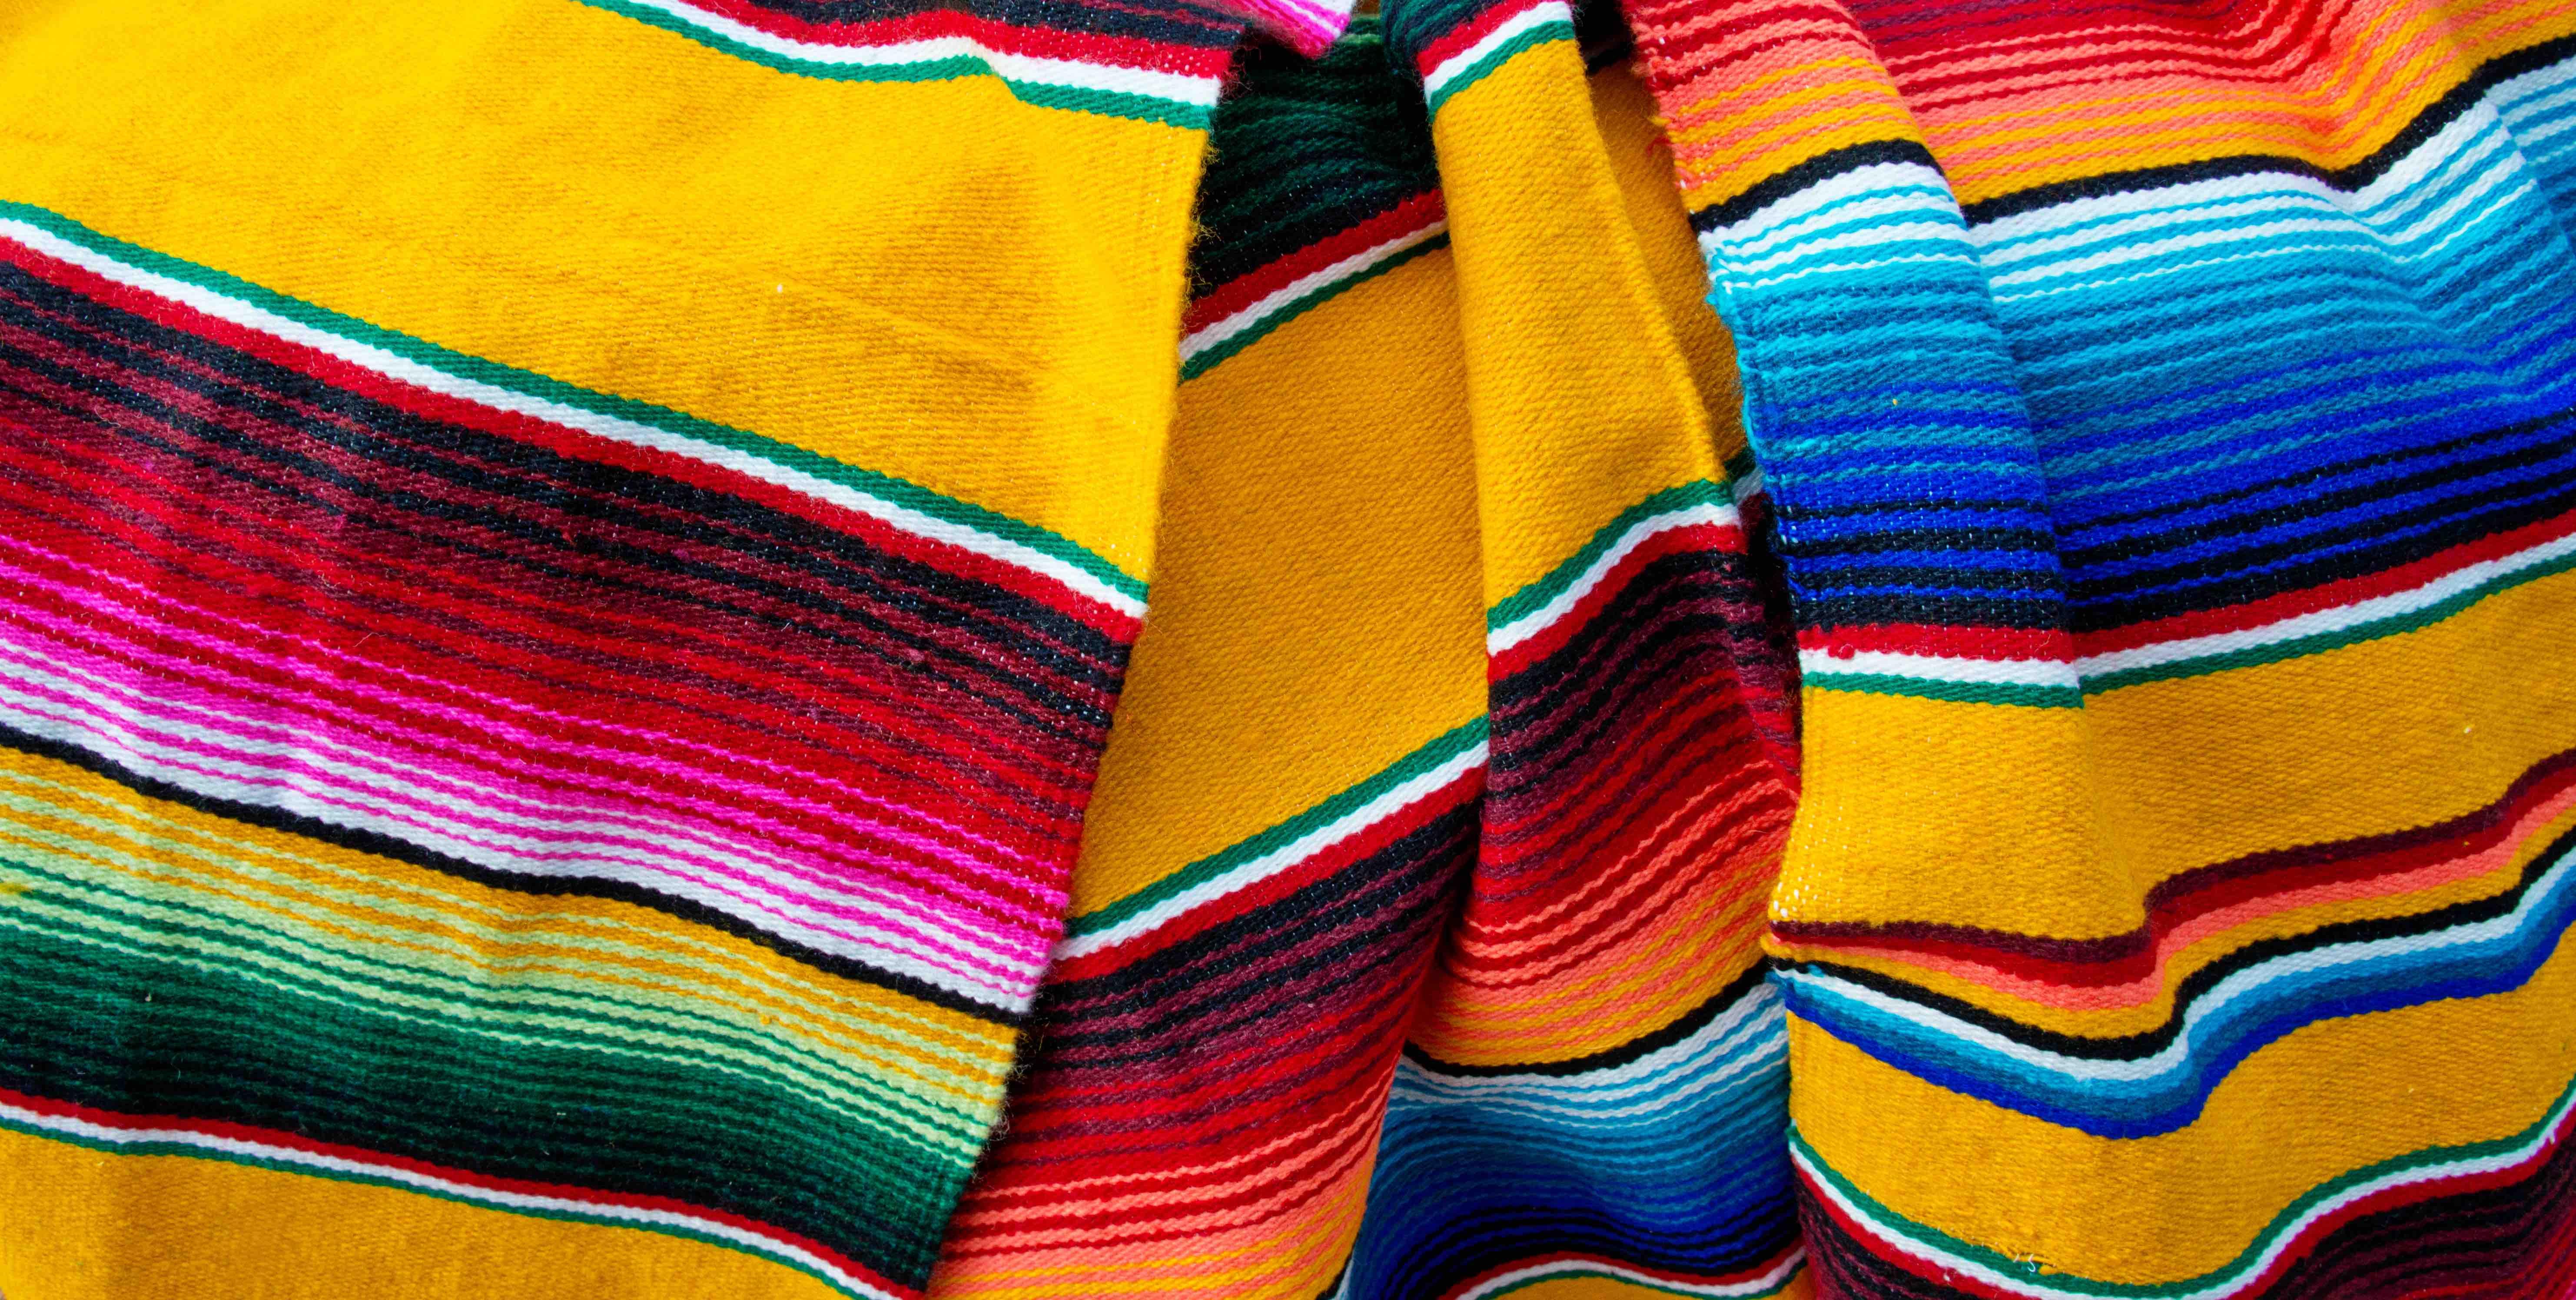 """If You Copy Our Craftsmanship, We Lose Work"": How Brands Like Carolina Herrera Are Hurting Artisans"